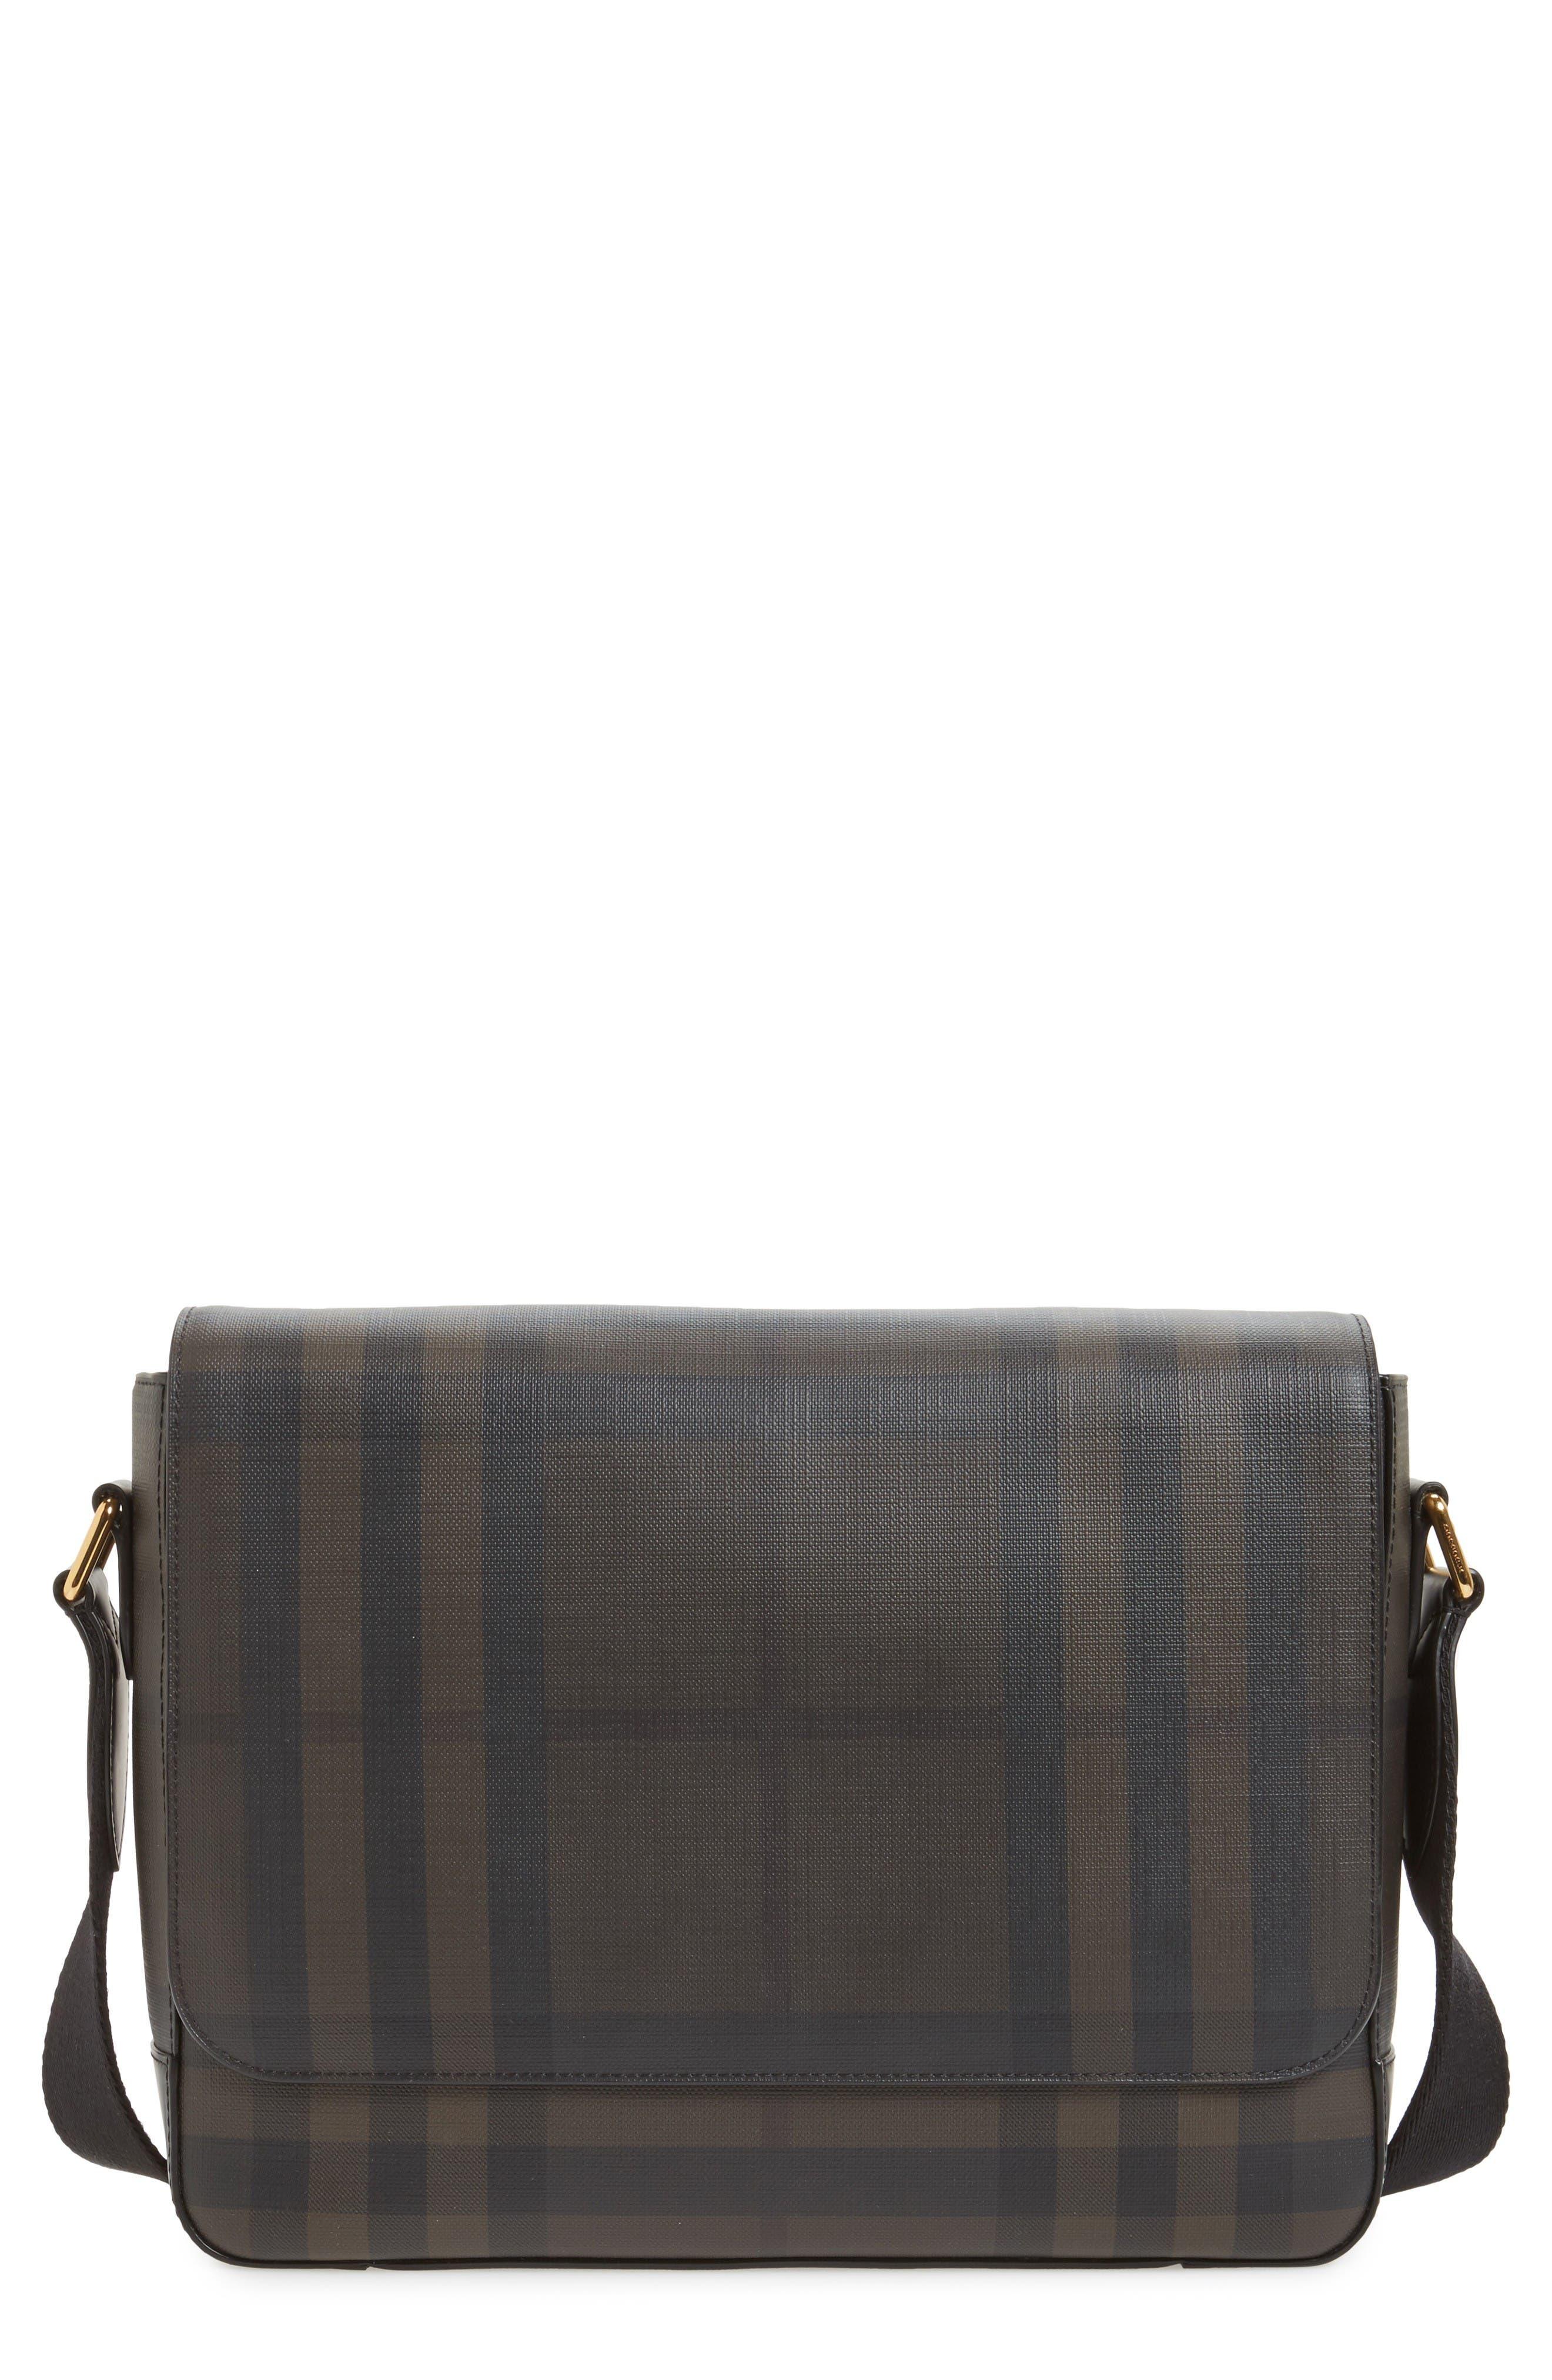 Edgware Check Messenger Bag,                             Main thumbnail 1, color,                             Chocolate/ Black